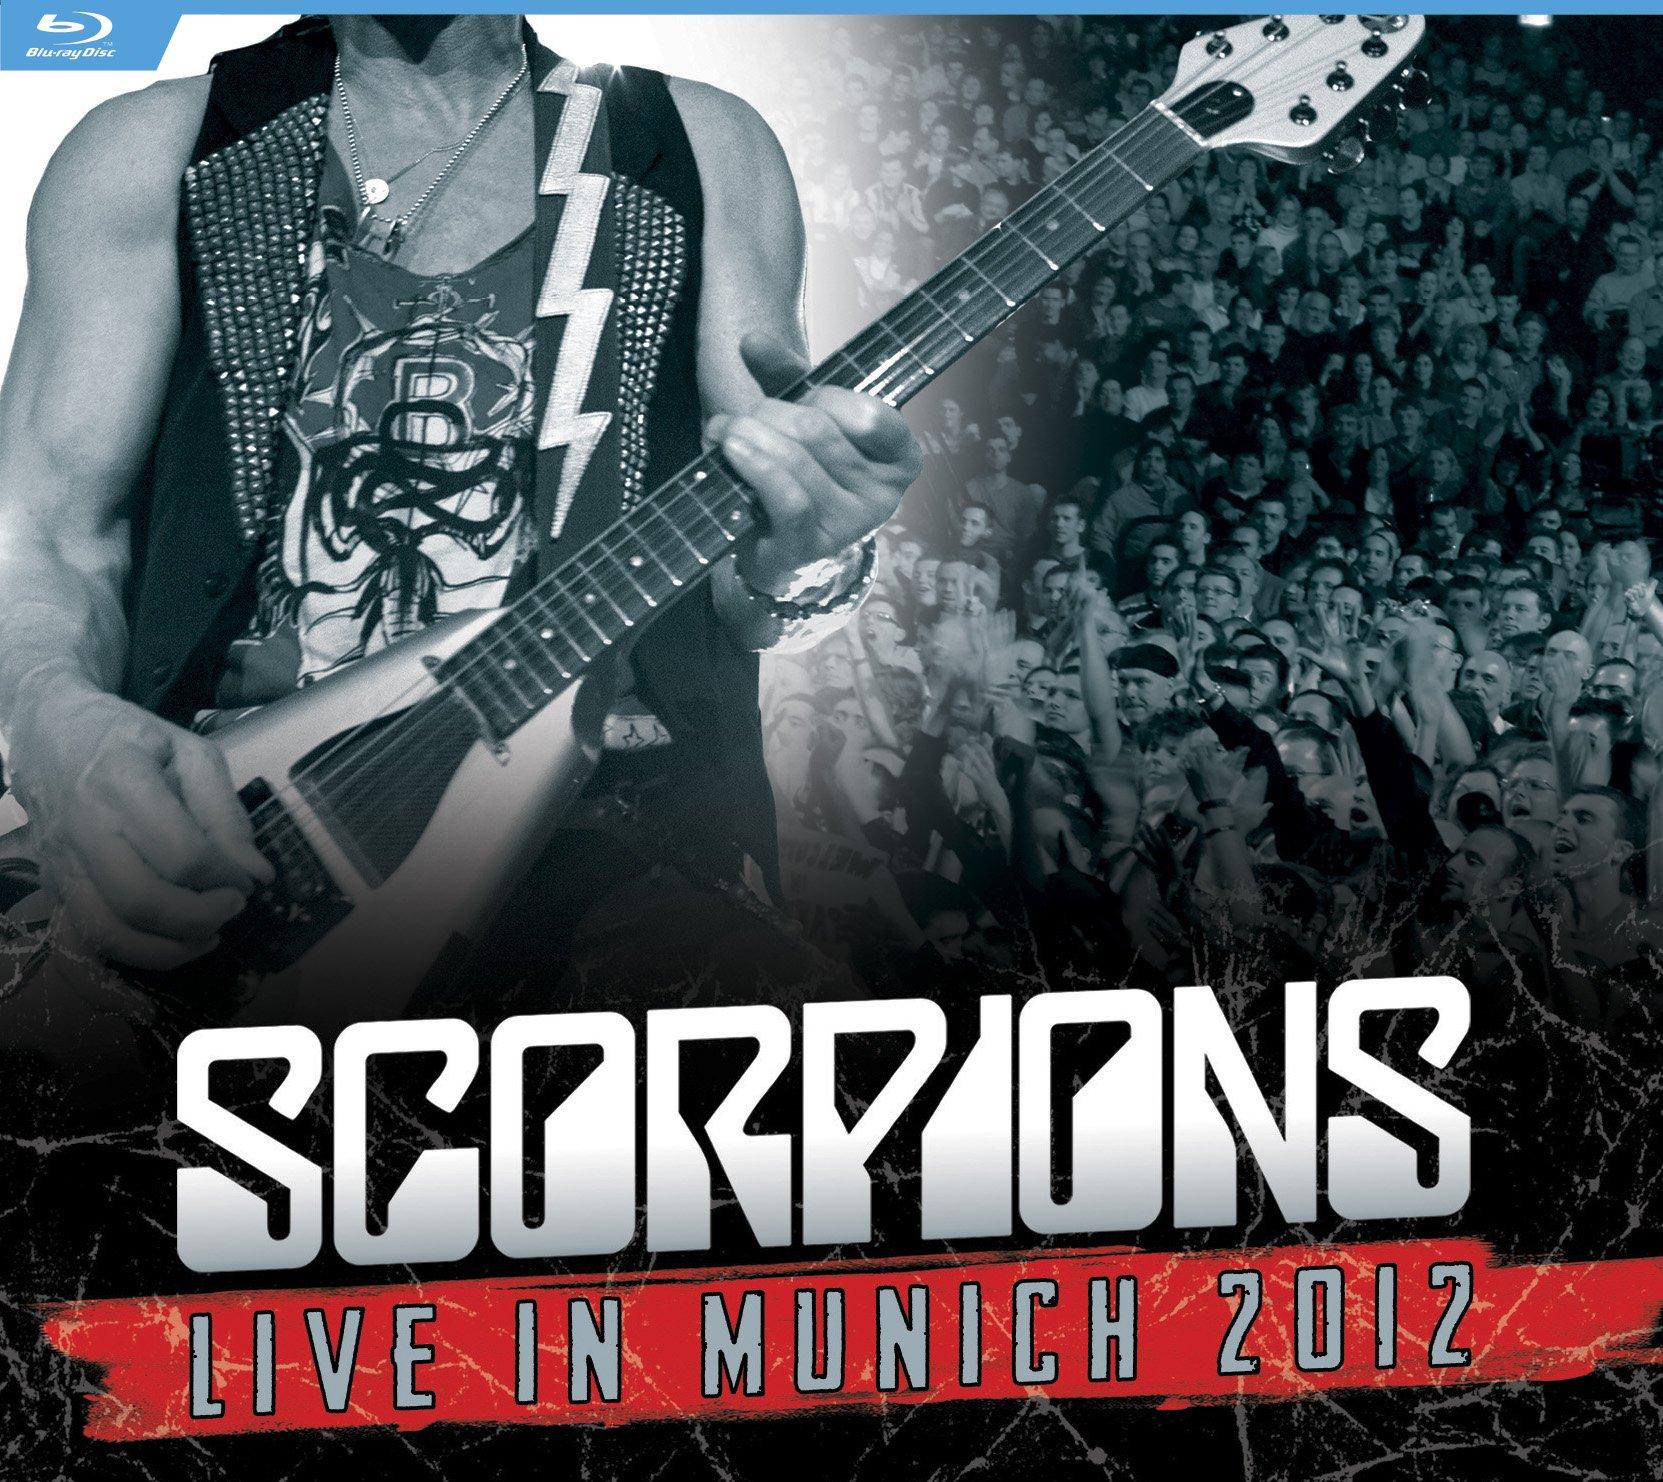 Blu-ray : Scorpions - Live In Munich 2012 (Blu-ray)